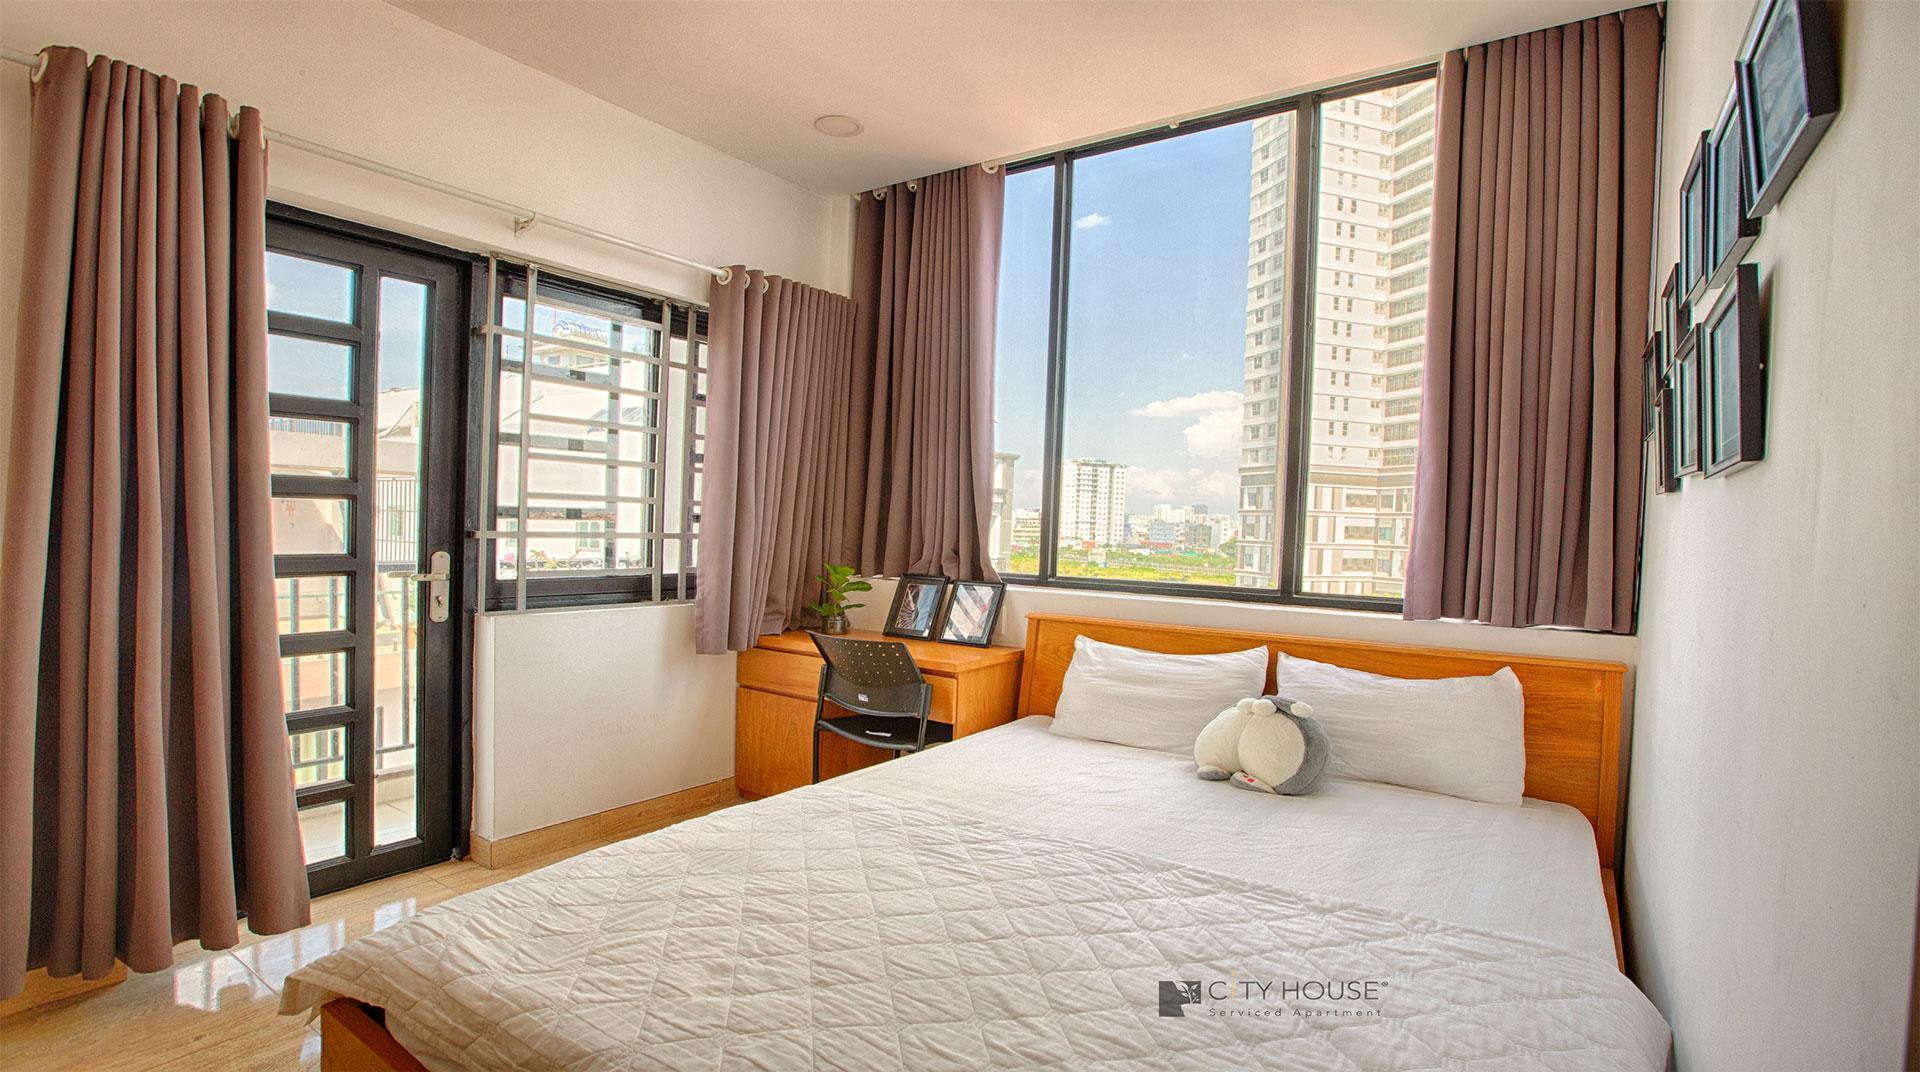 CityHouse   1Bedroom  Serviced Apartment Near D1